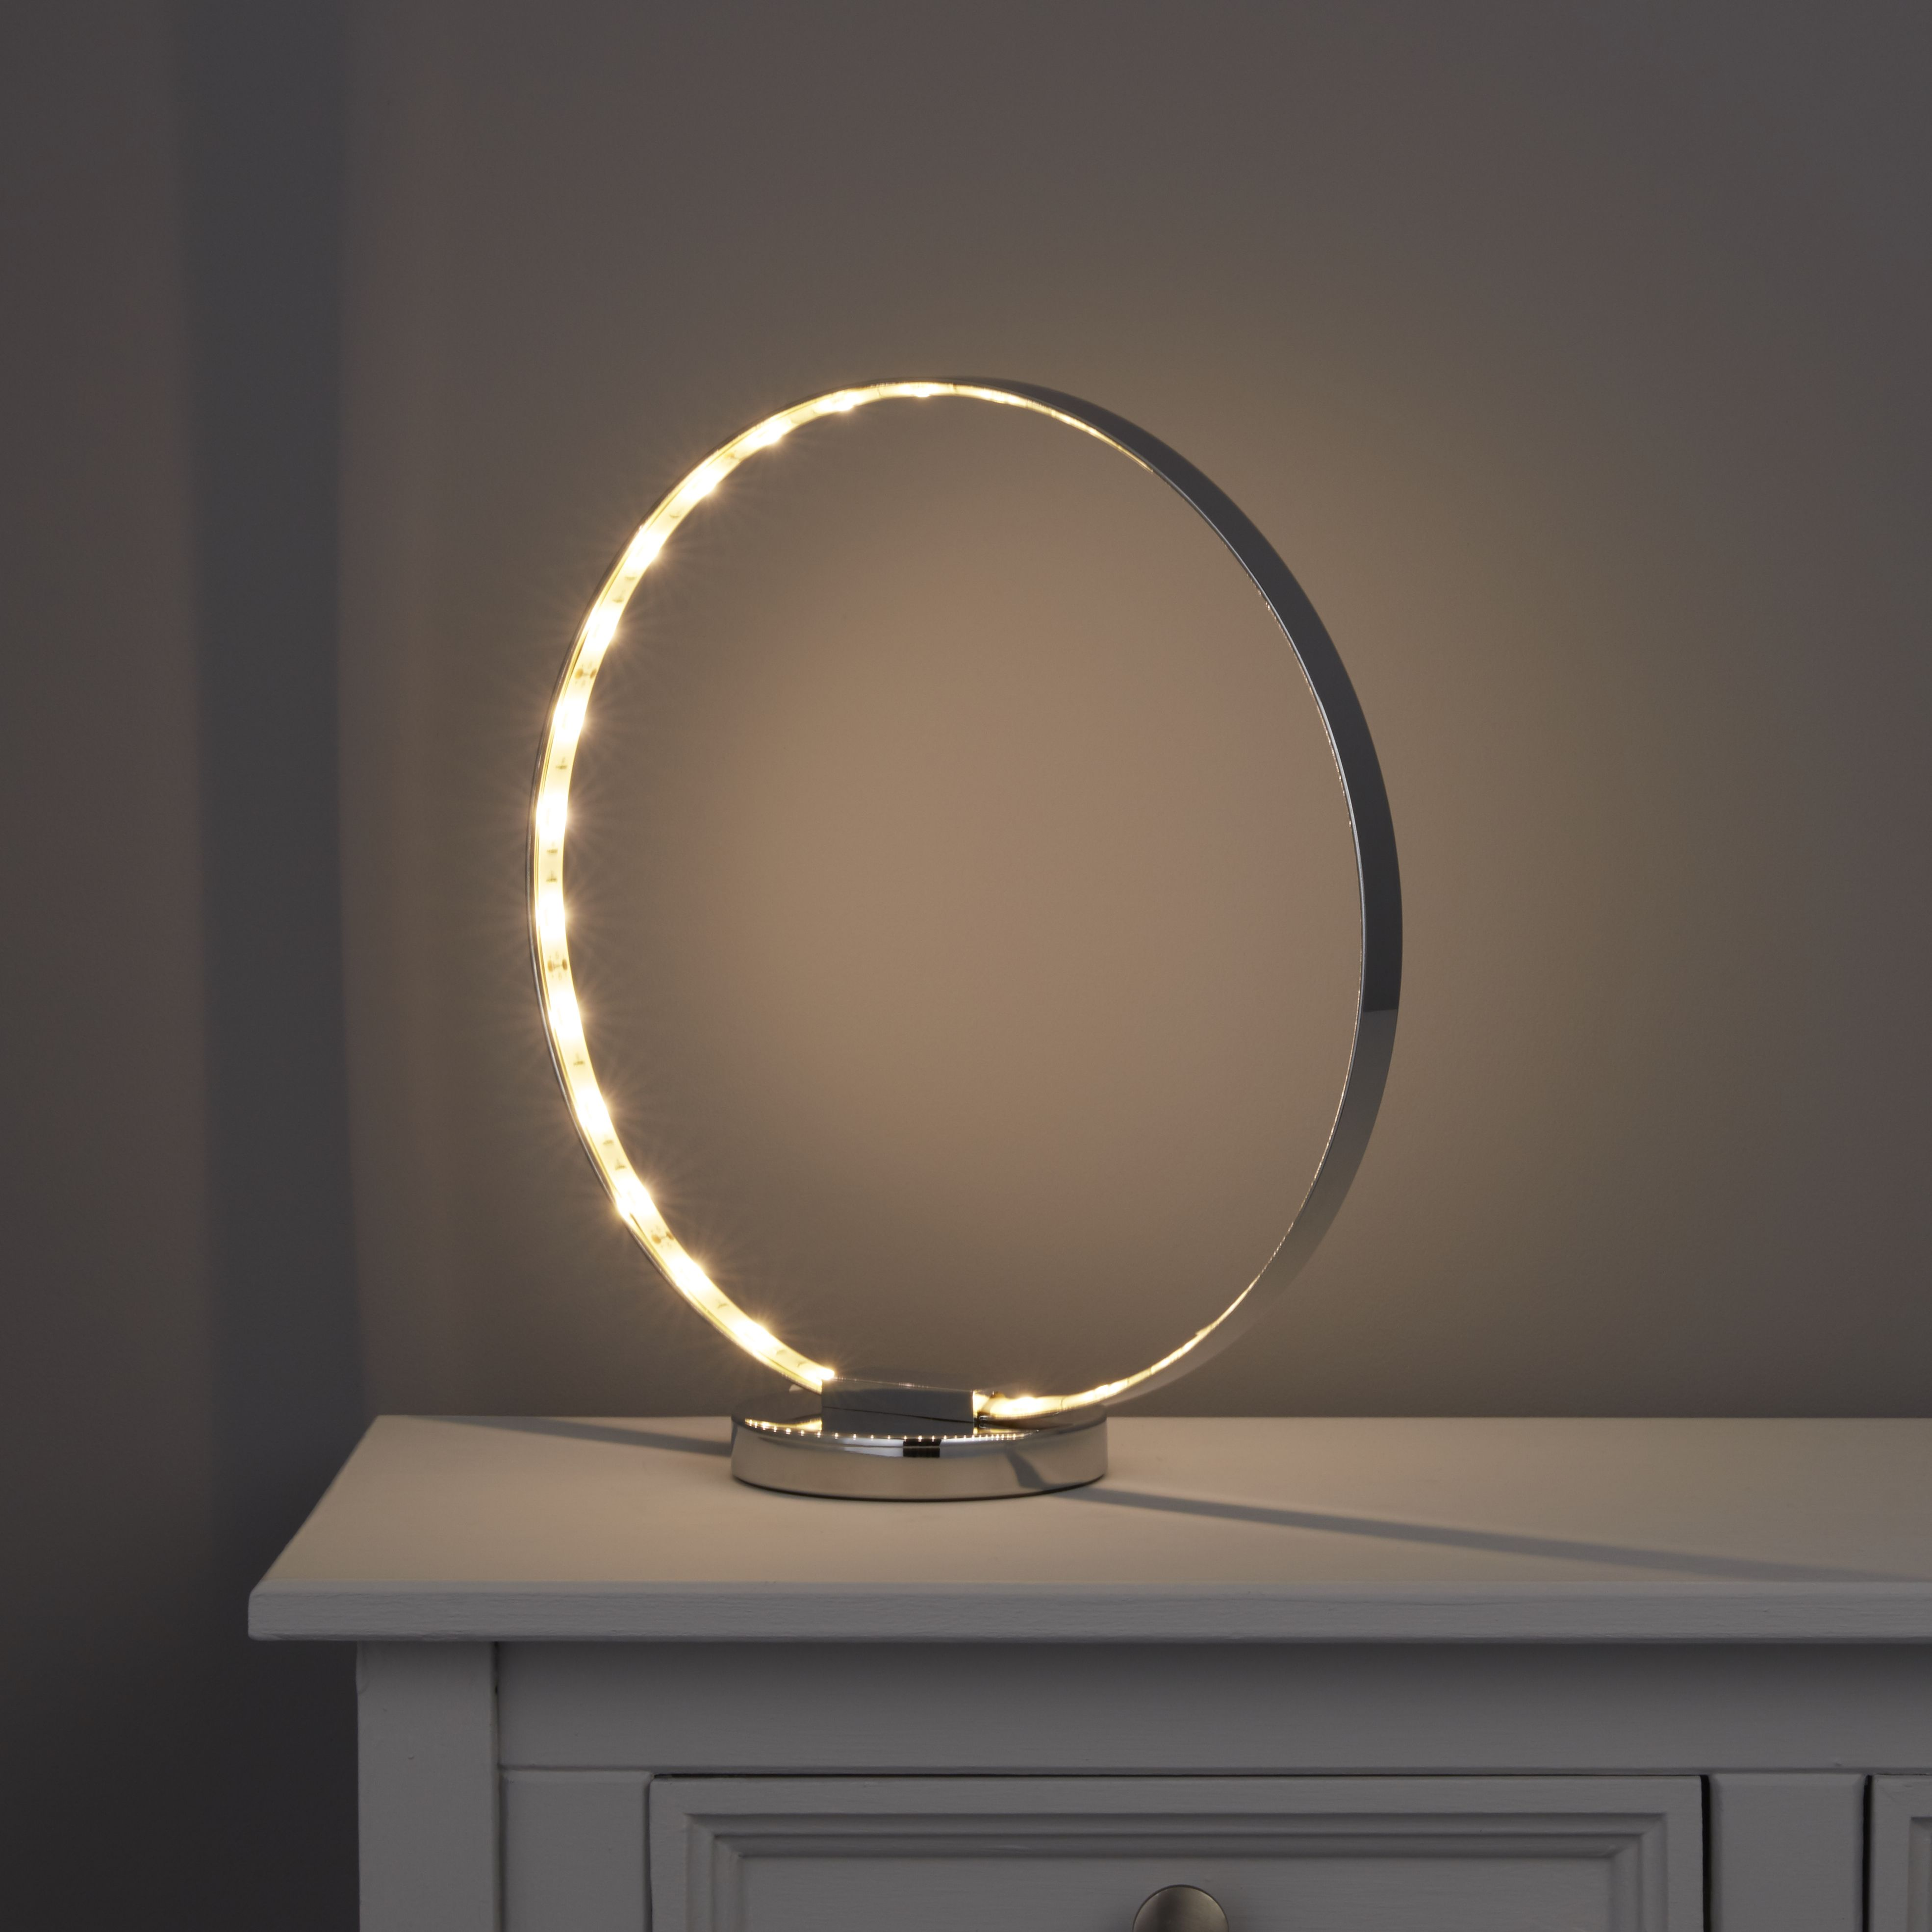 Ringo Modern Chrome Effect Table Lamp